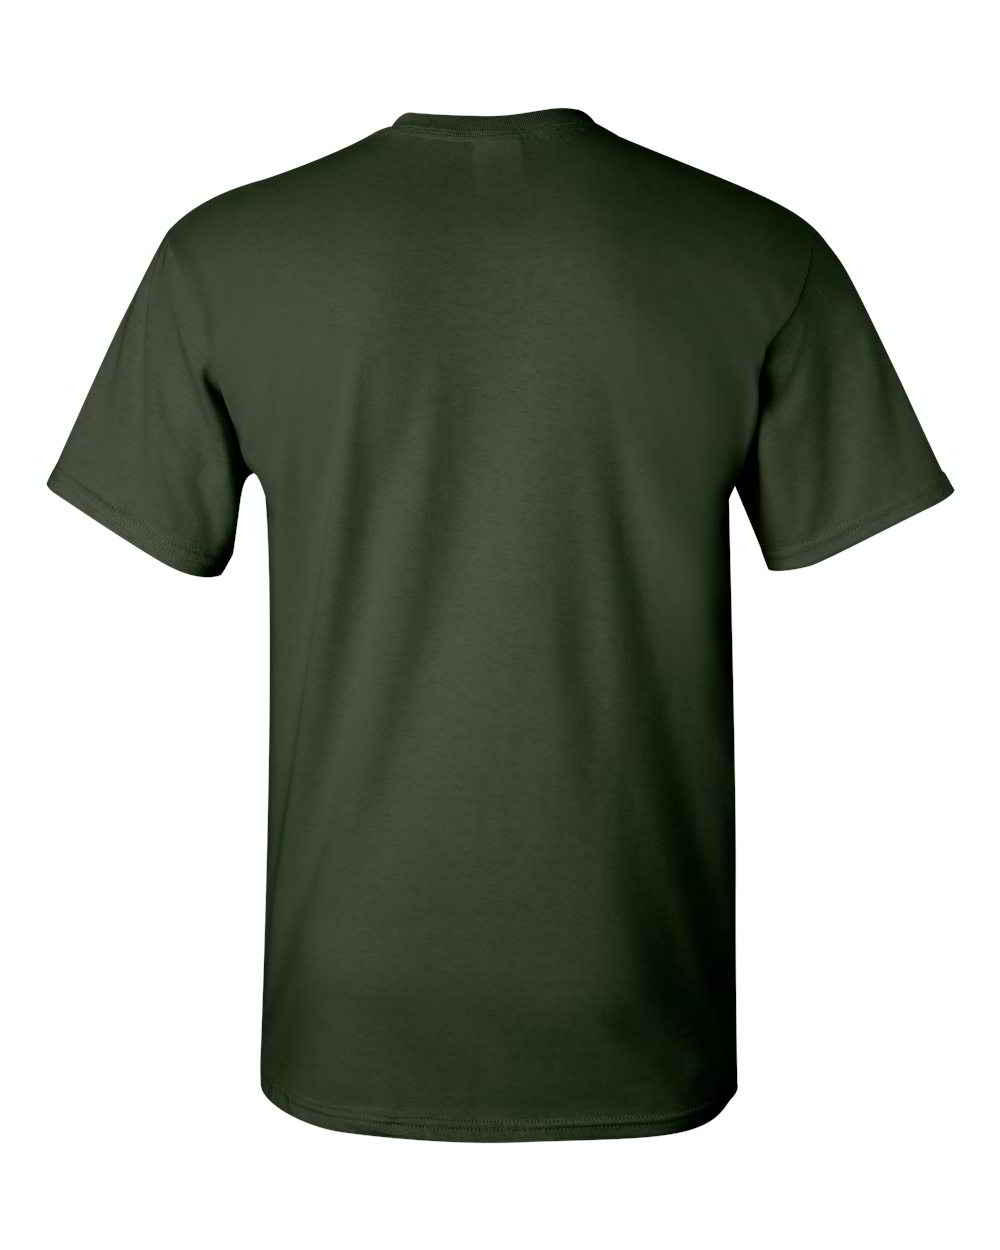 Gildan-Heavy-Cotton-Short-Sleeve-Mens-Green-T-Shirts-5000 thumbnail 8